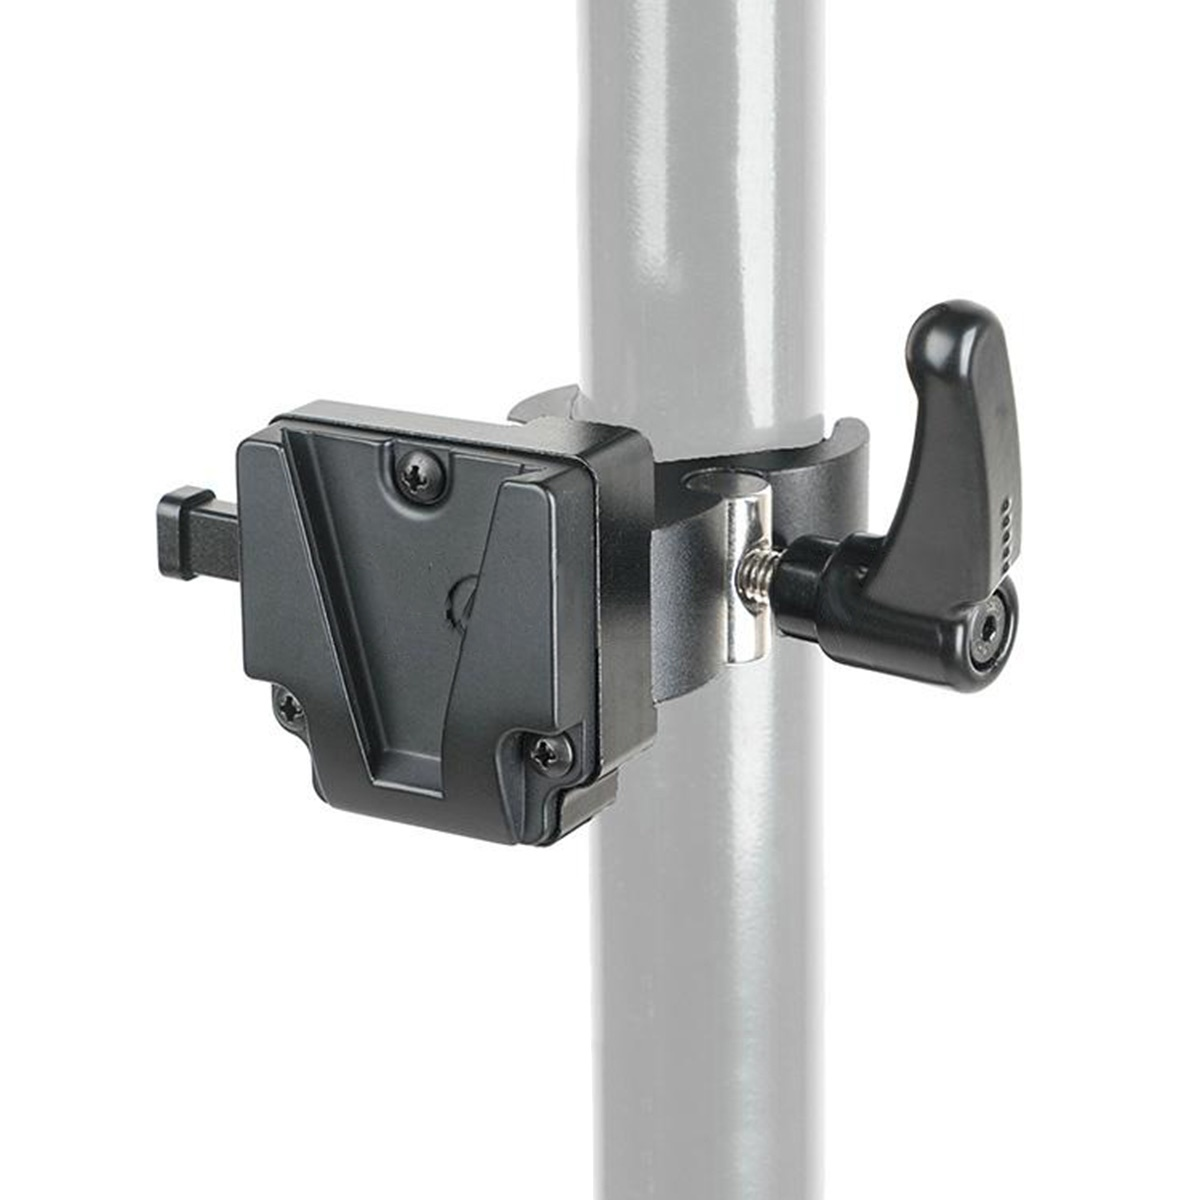 CAME-TV V-Mount Clamp adapter/úchyt pre batérie s V-mount úchytom na tyč